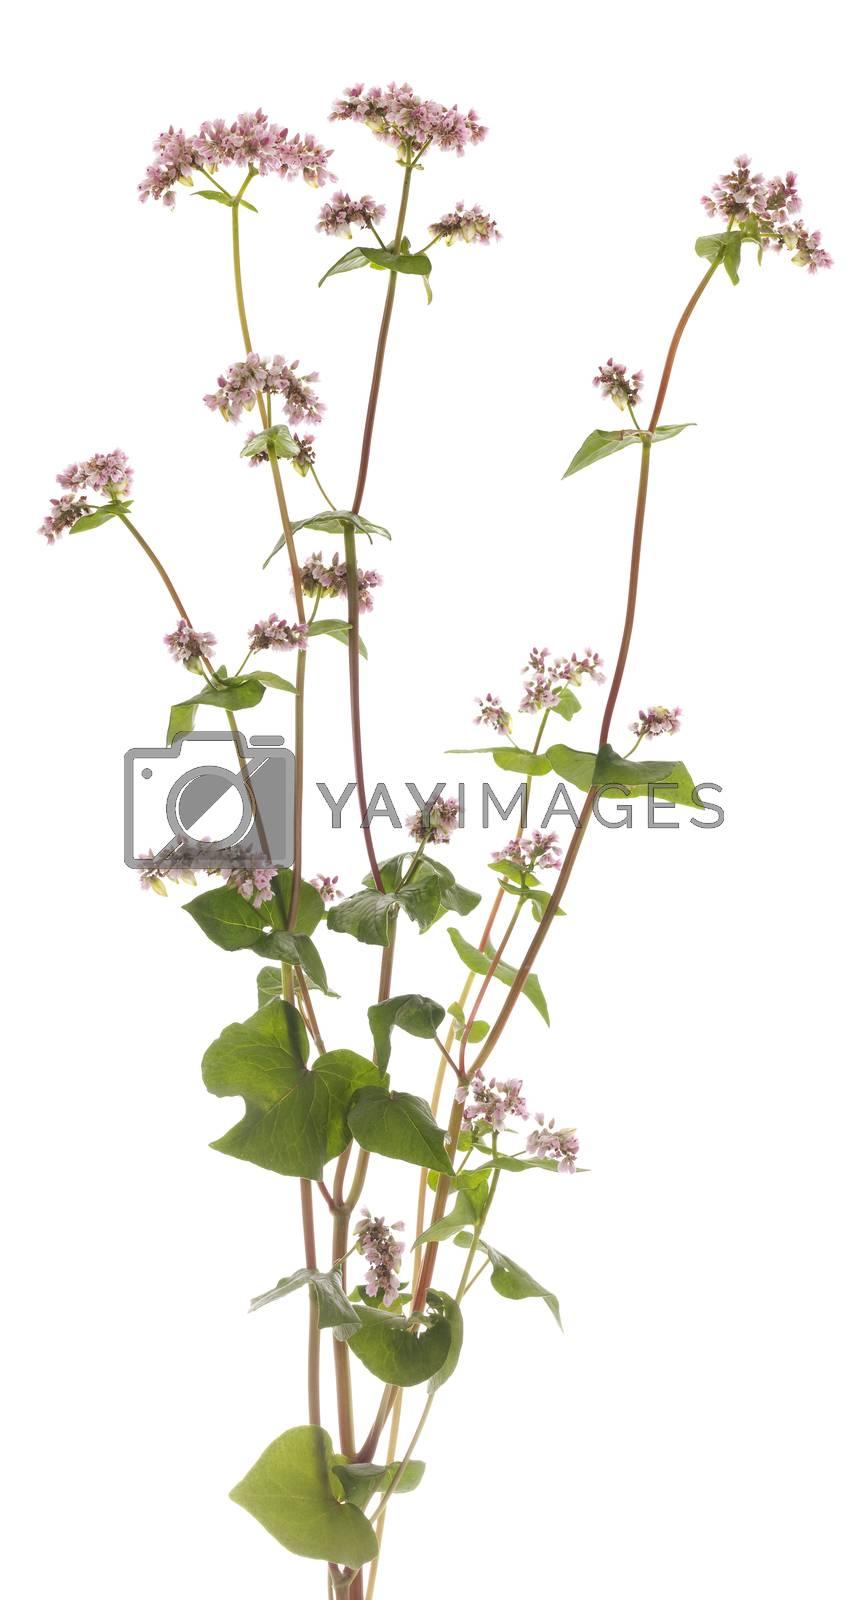 flower buckwheat (Fagopyrum Mill) on white background